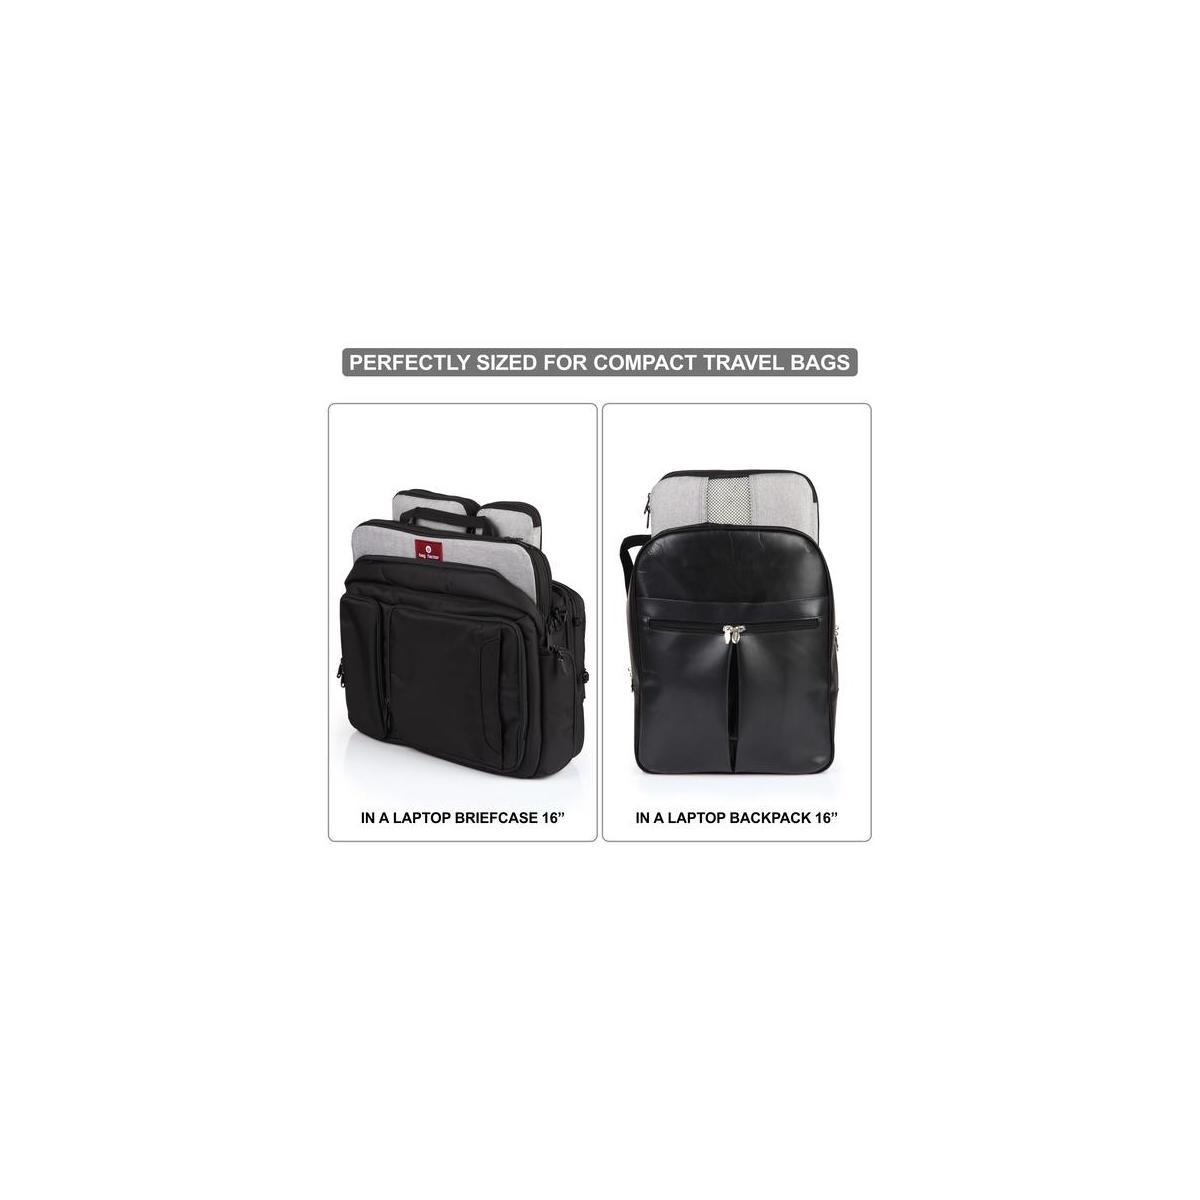 Compression Packing Cubes for Travel - Bag Factor Premium Luggage Organizer Set  (Light Grey)